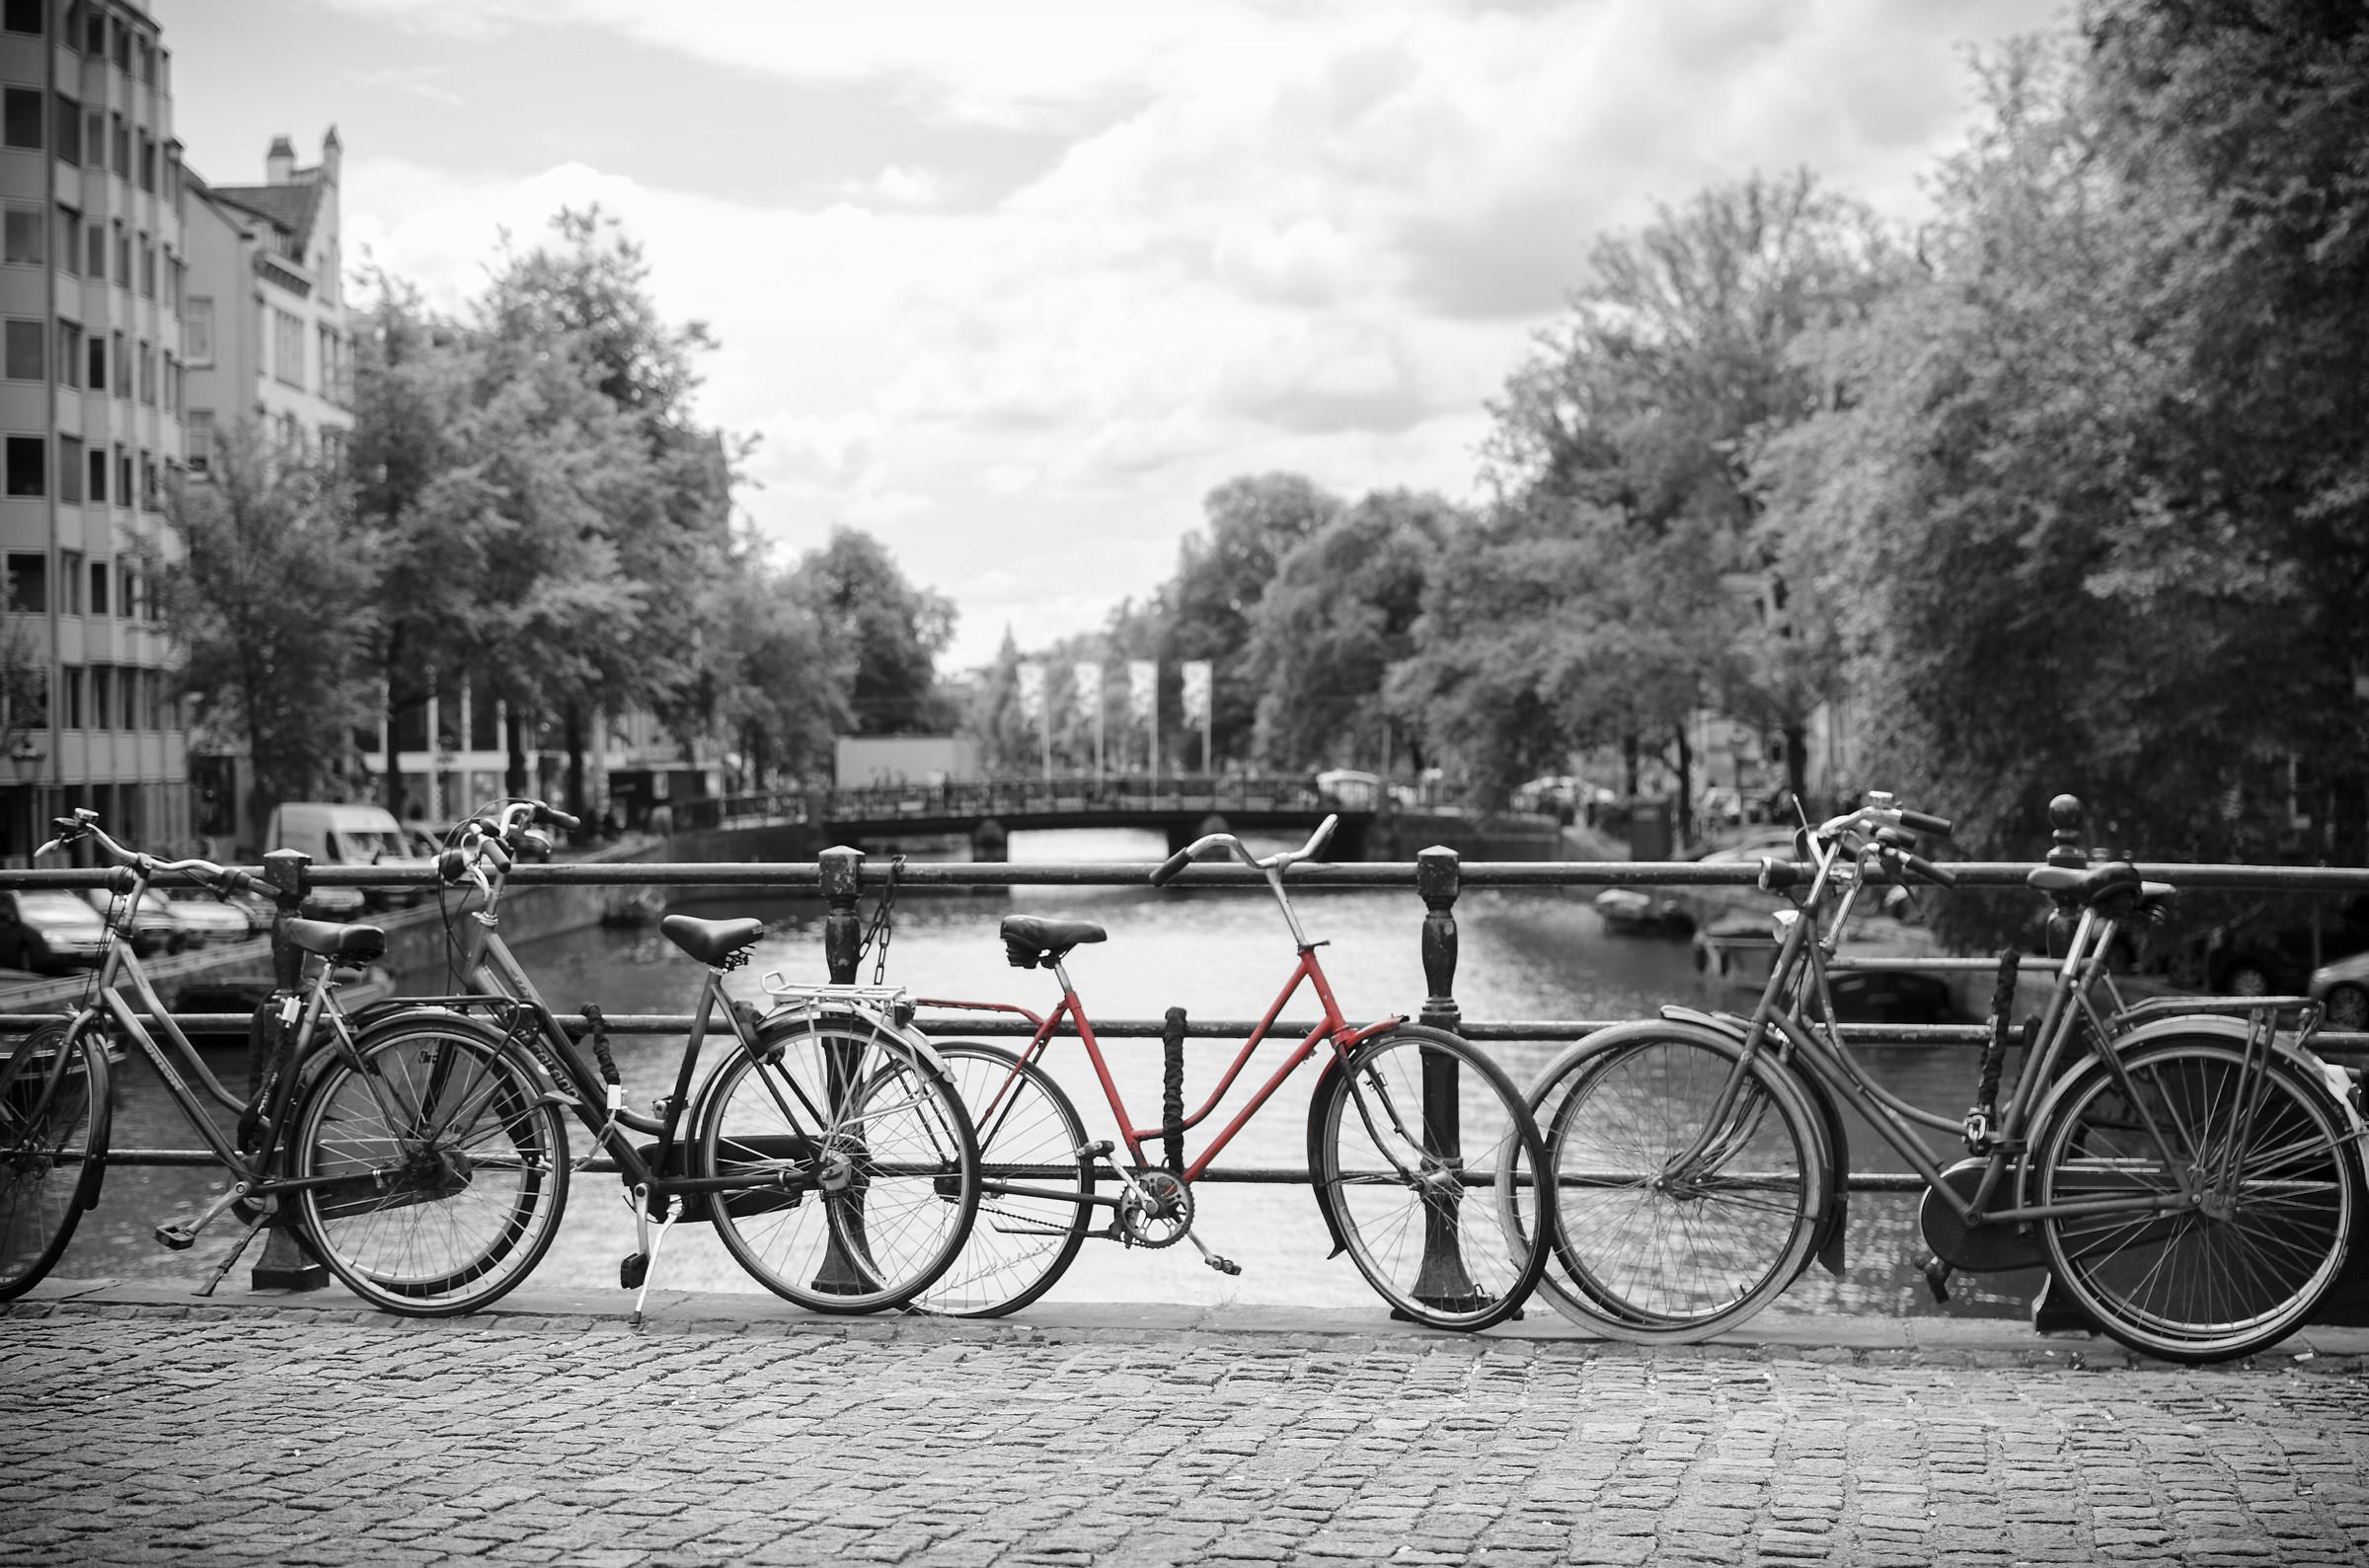 Amsterdam in b&w...